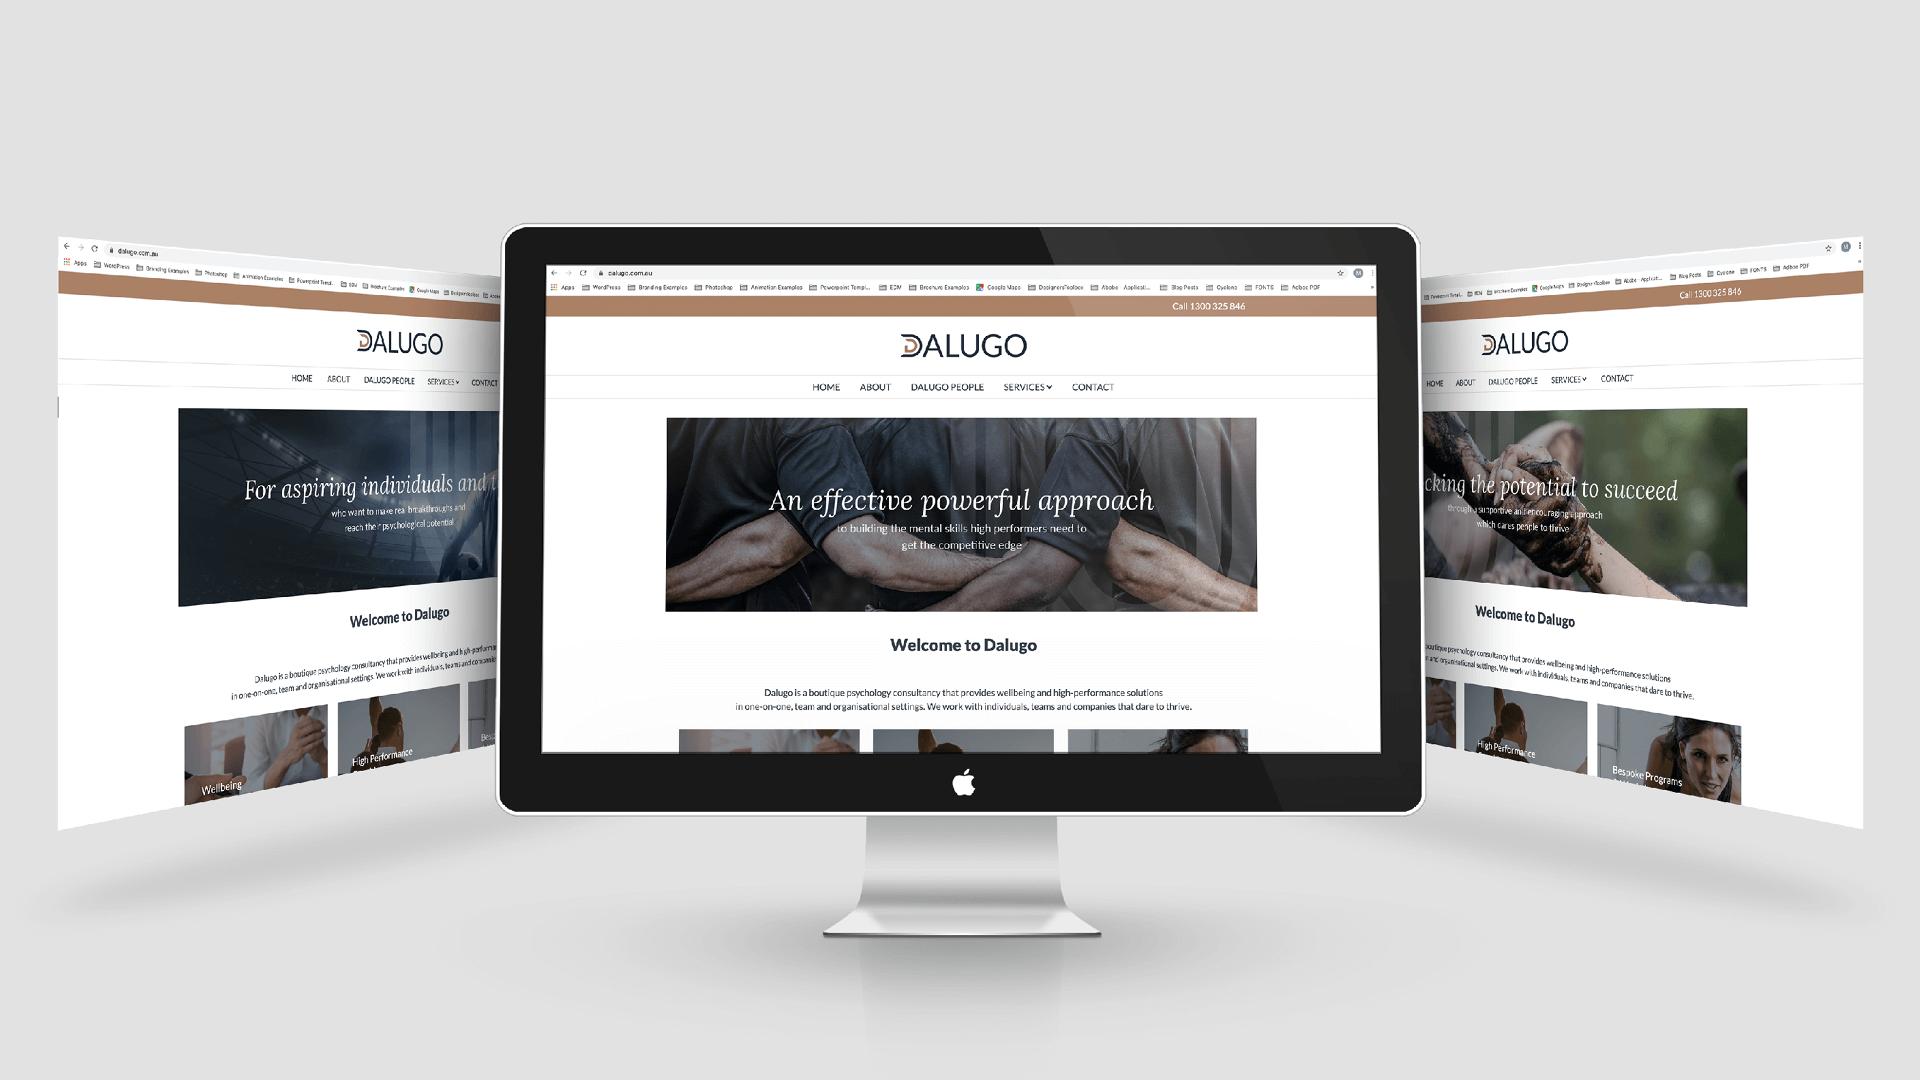 Dalugo – Branding and Marketing - Zadro Agency